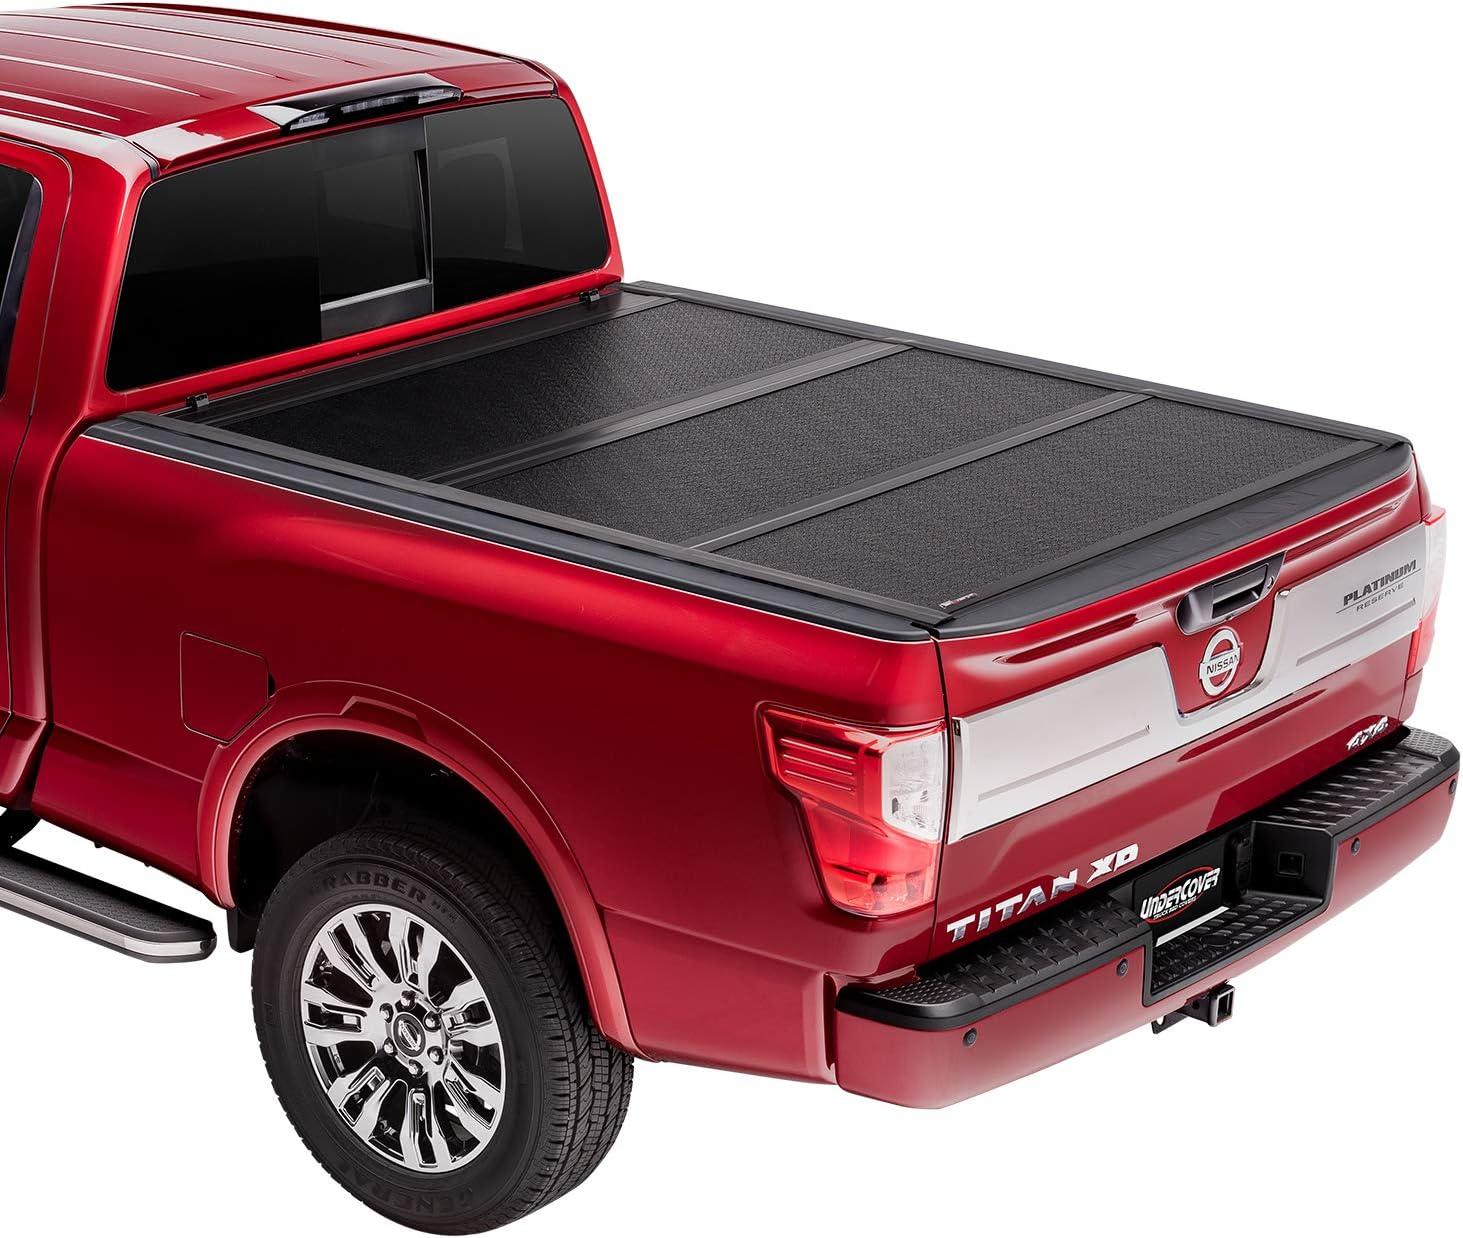 Wholesale UnderCover Flex Hard Folding Truck Cover Tonneau Bed FX51013 Mail order cheap